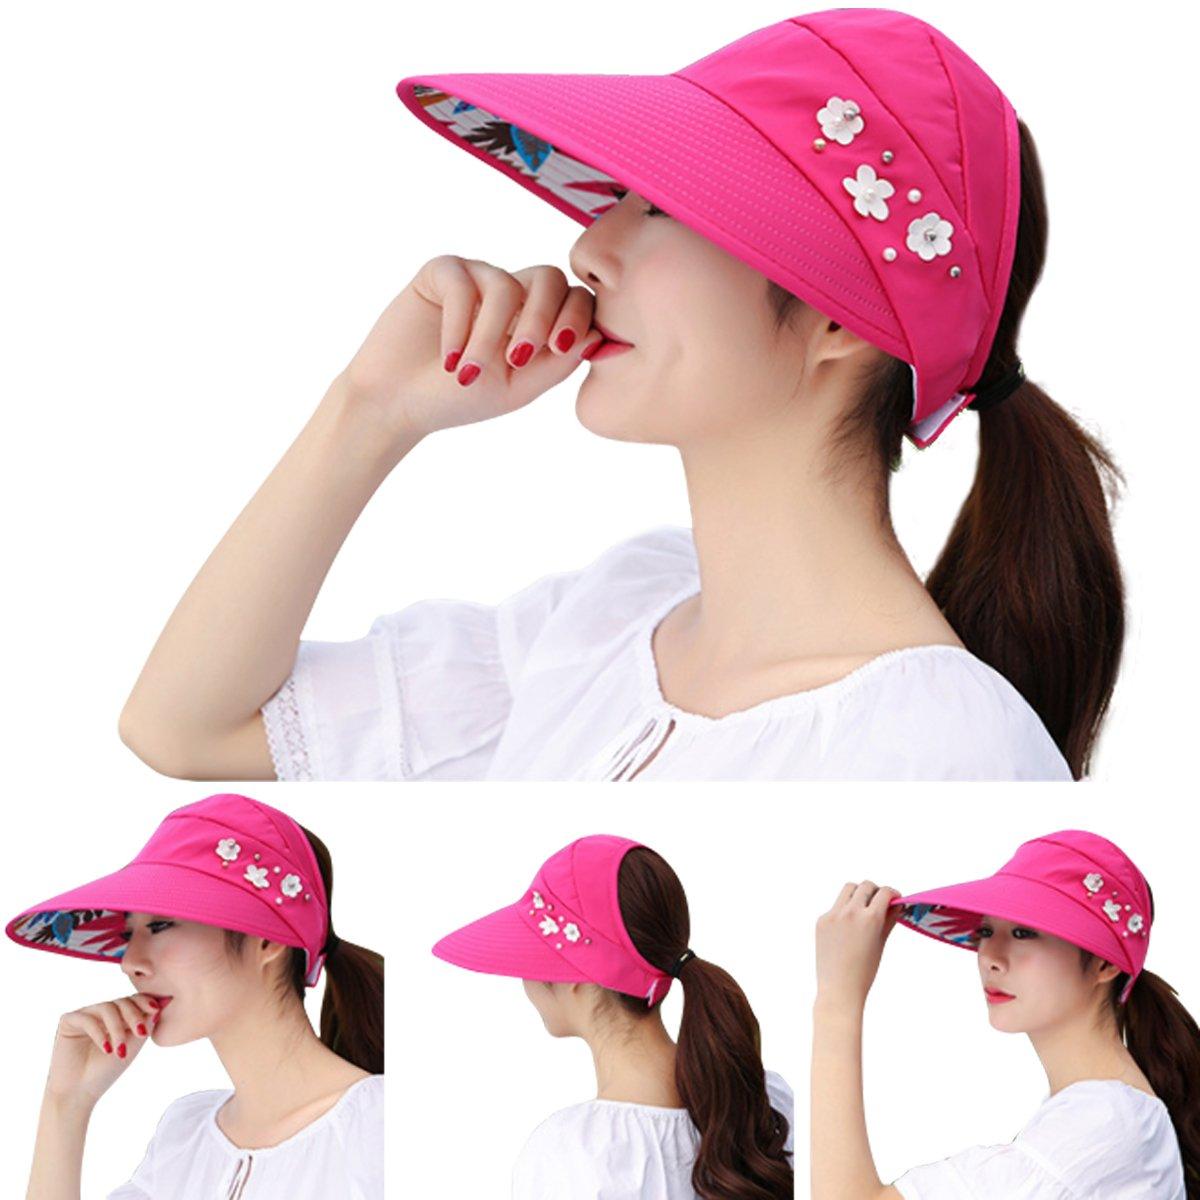 918bd62bd9cc39 JOYEBUY Women Wide Brim UV Protection Summer Beach Visor Cap Sun Hat  visorhat090014 Skullies & Beanies ...